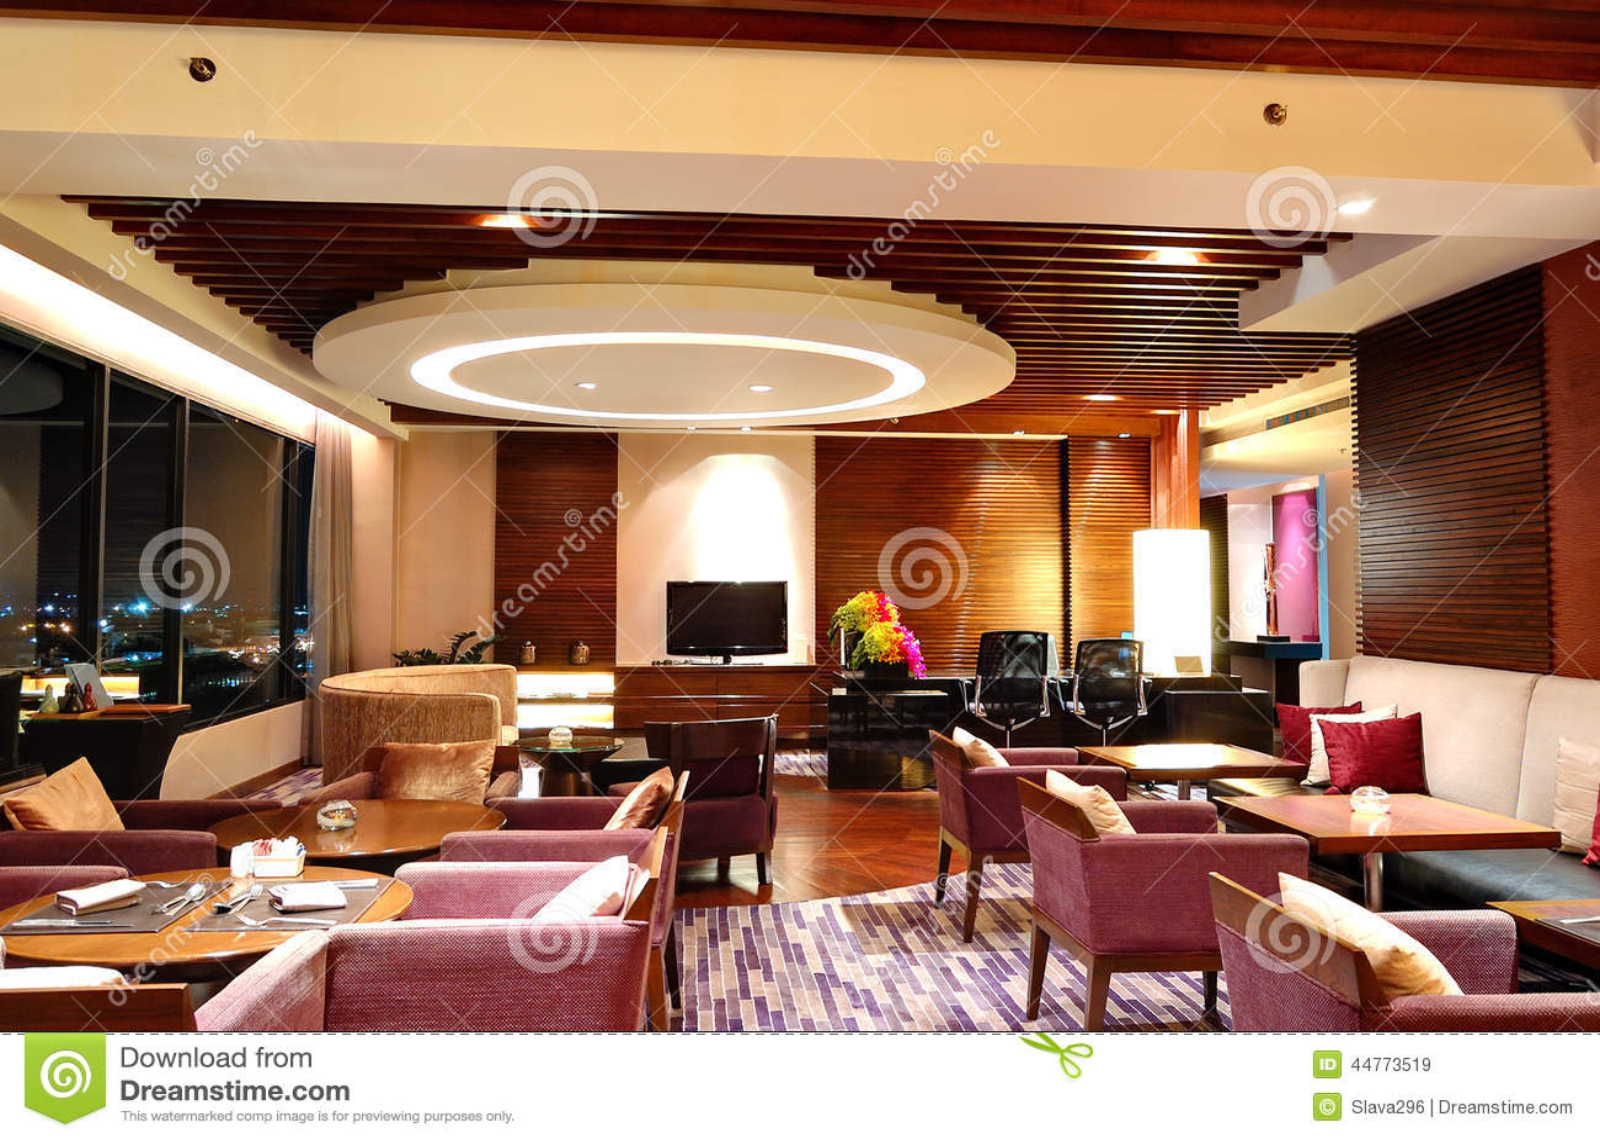 Modern restaurant interior in night illumination and city